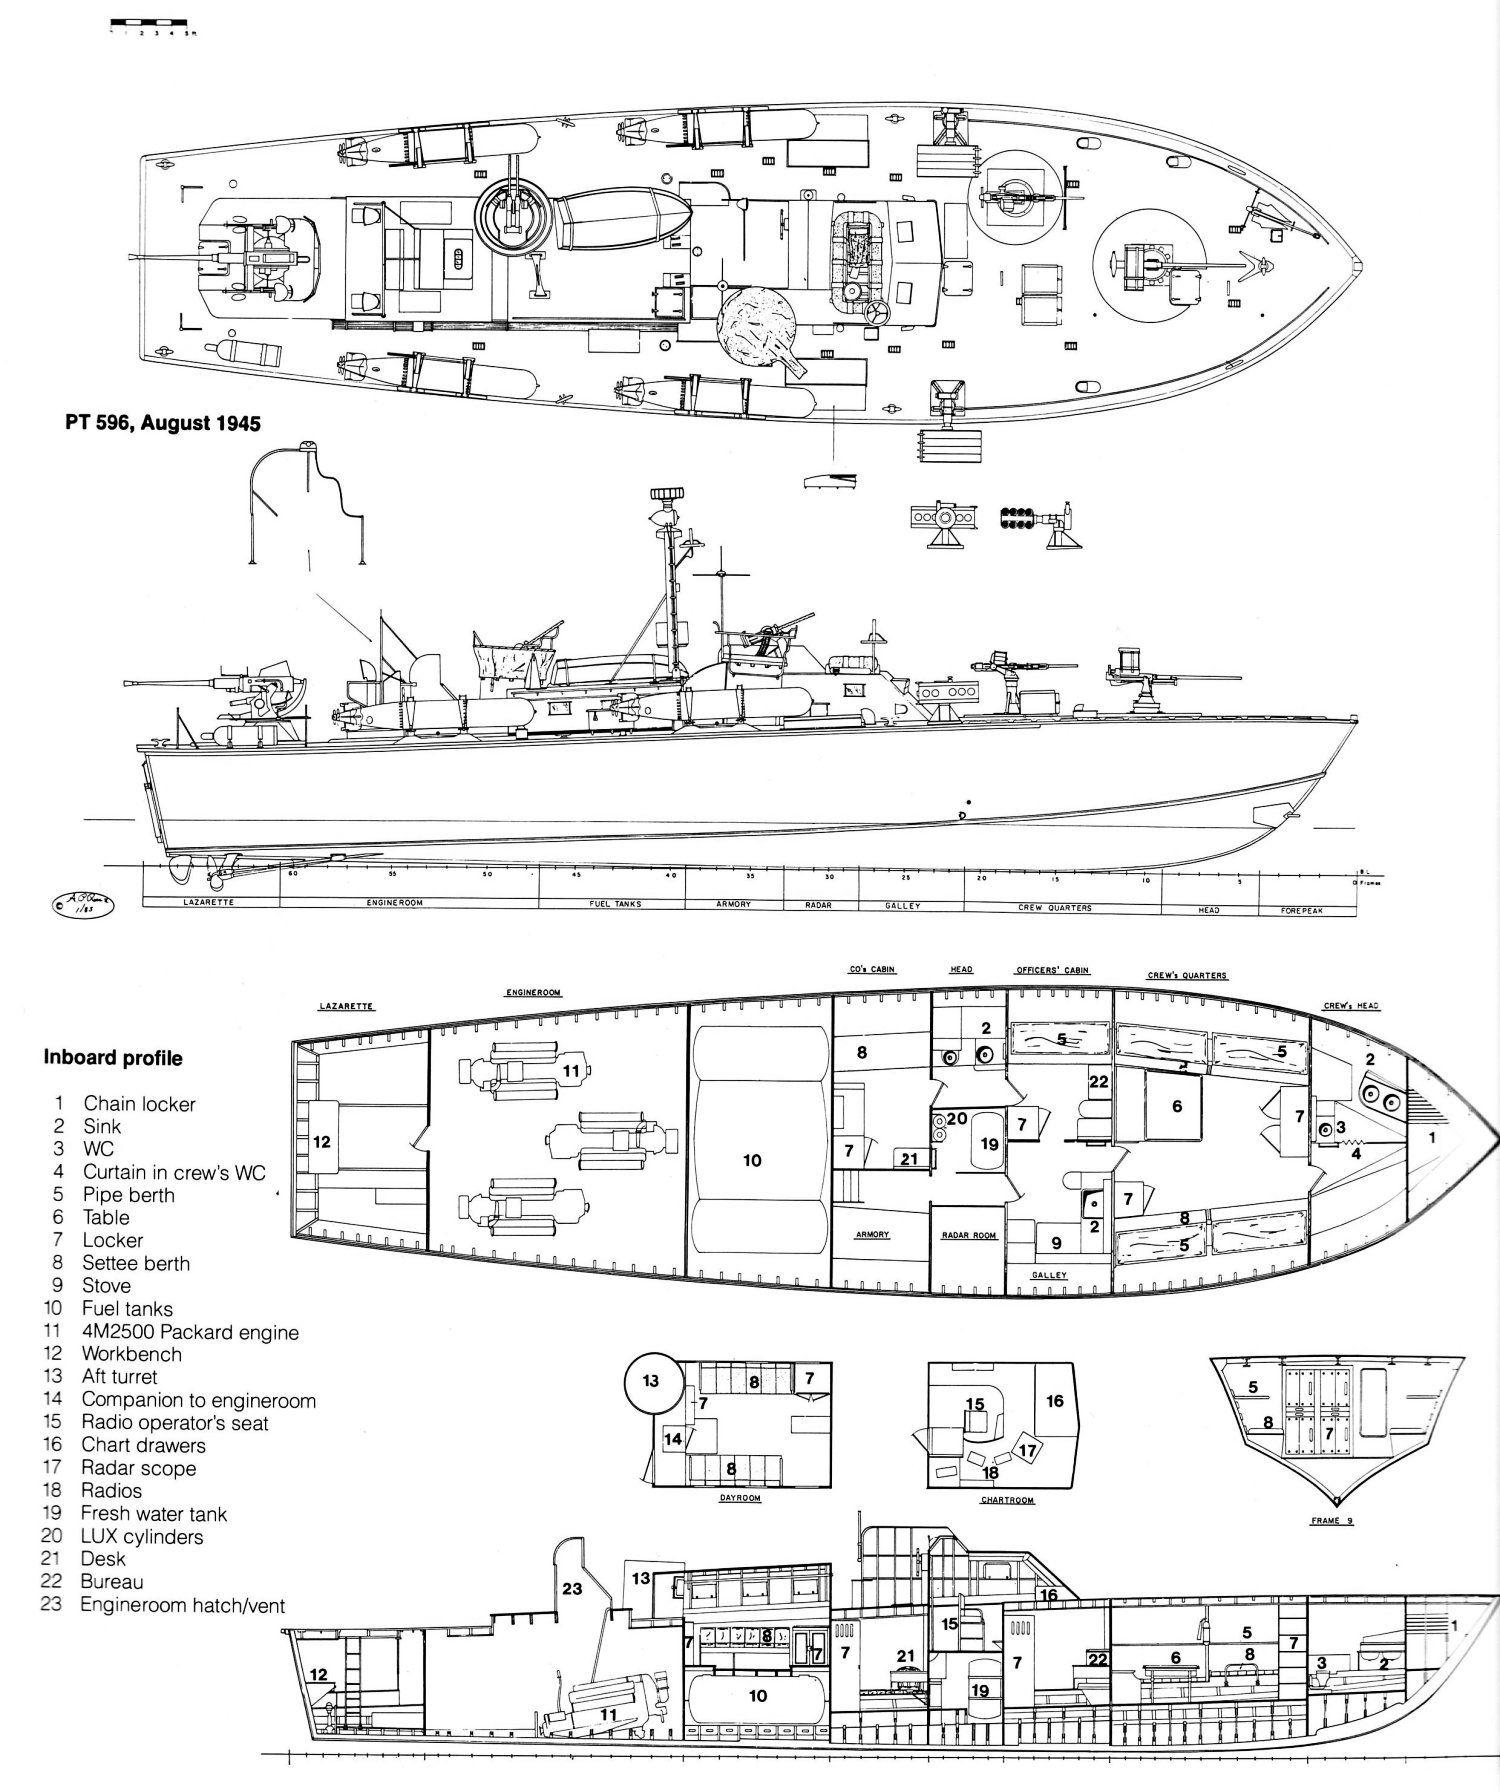 Balsa Wood Boat Plans Free   Artesanato em madeira diy